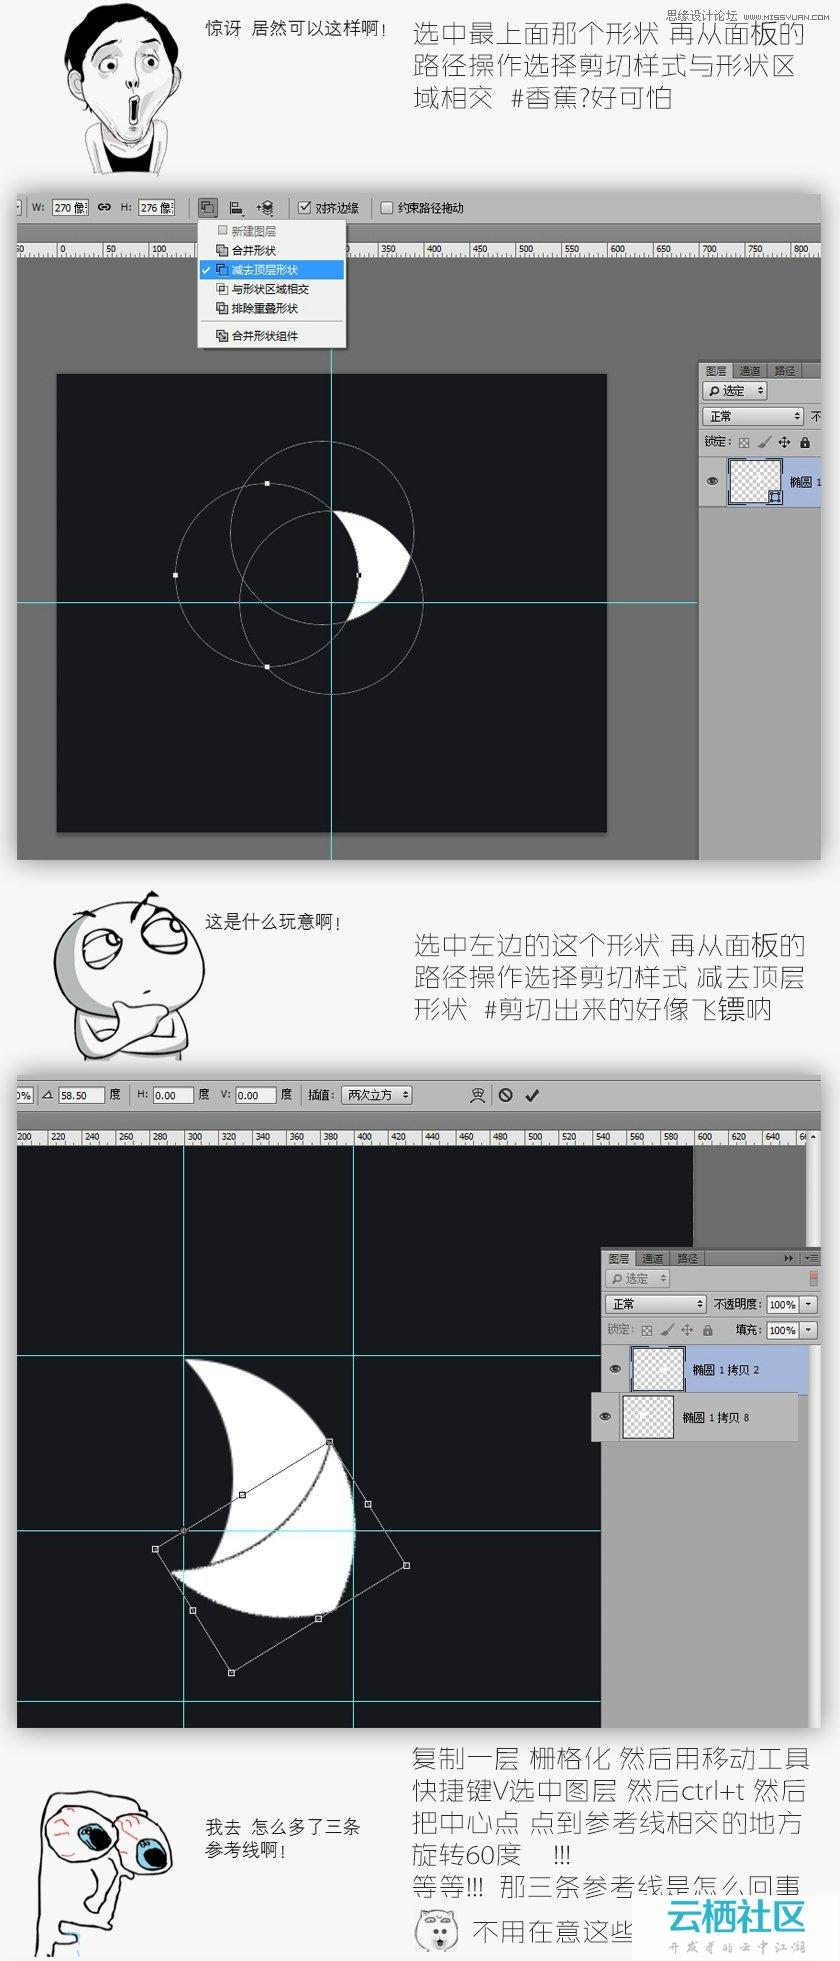 Photoshop绘制立体风格的快门镜头图标-photoshop场景绘制